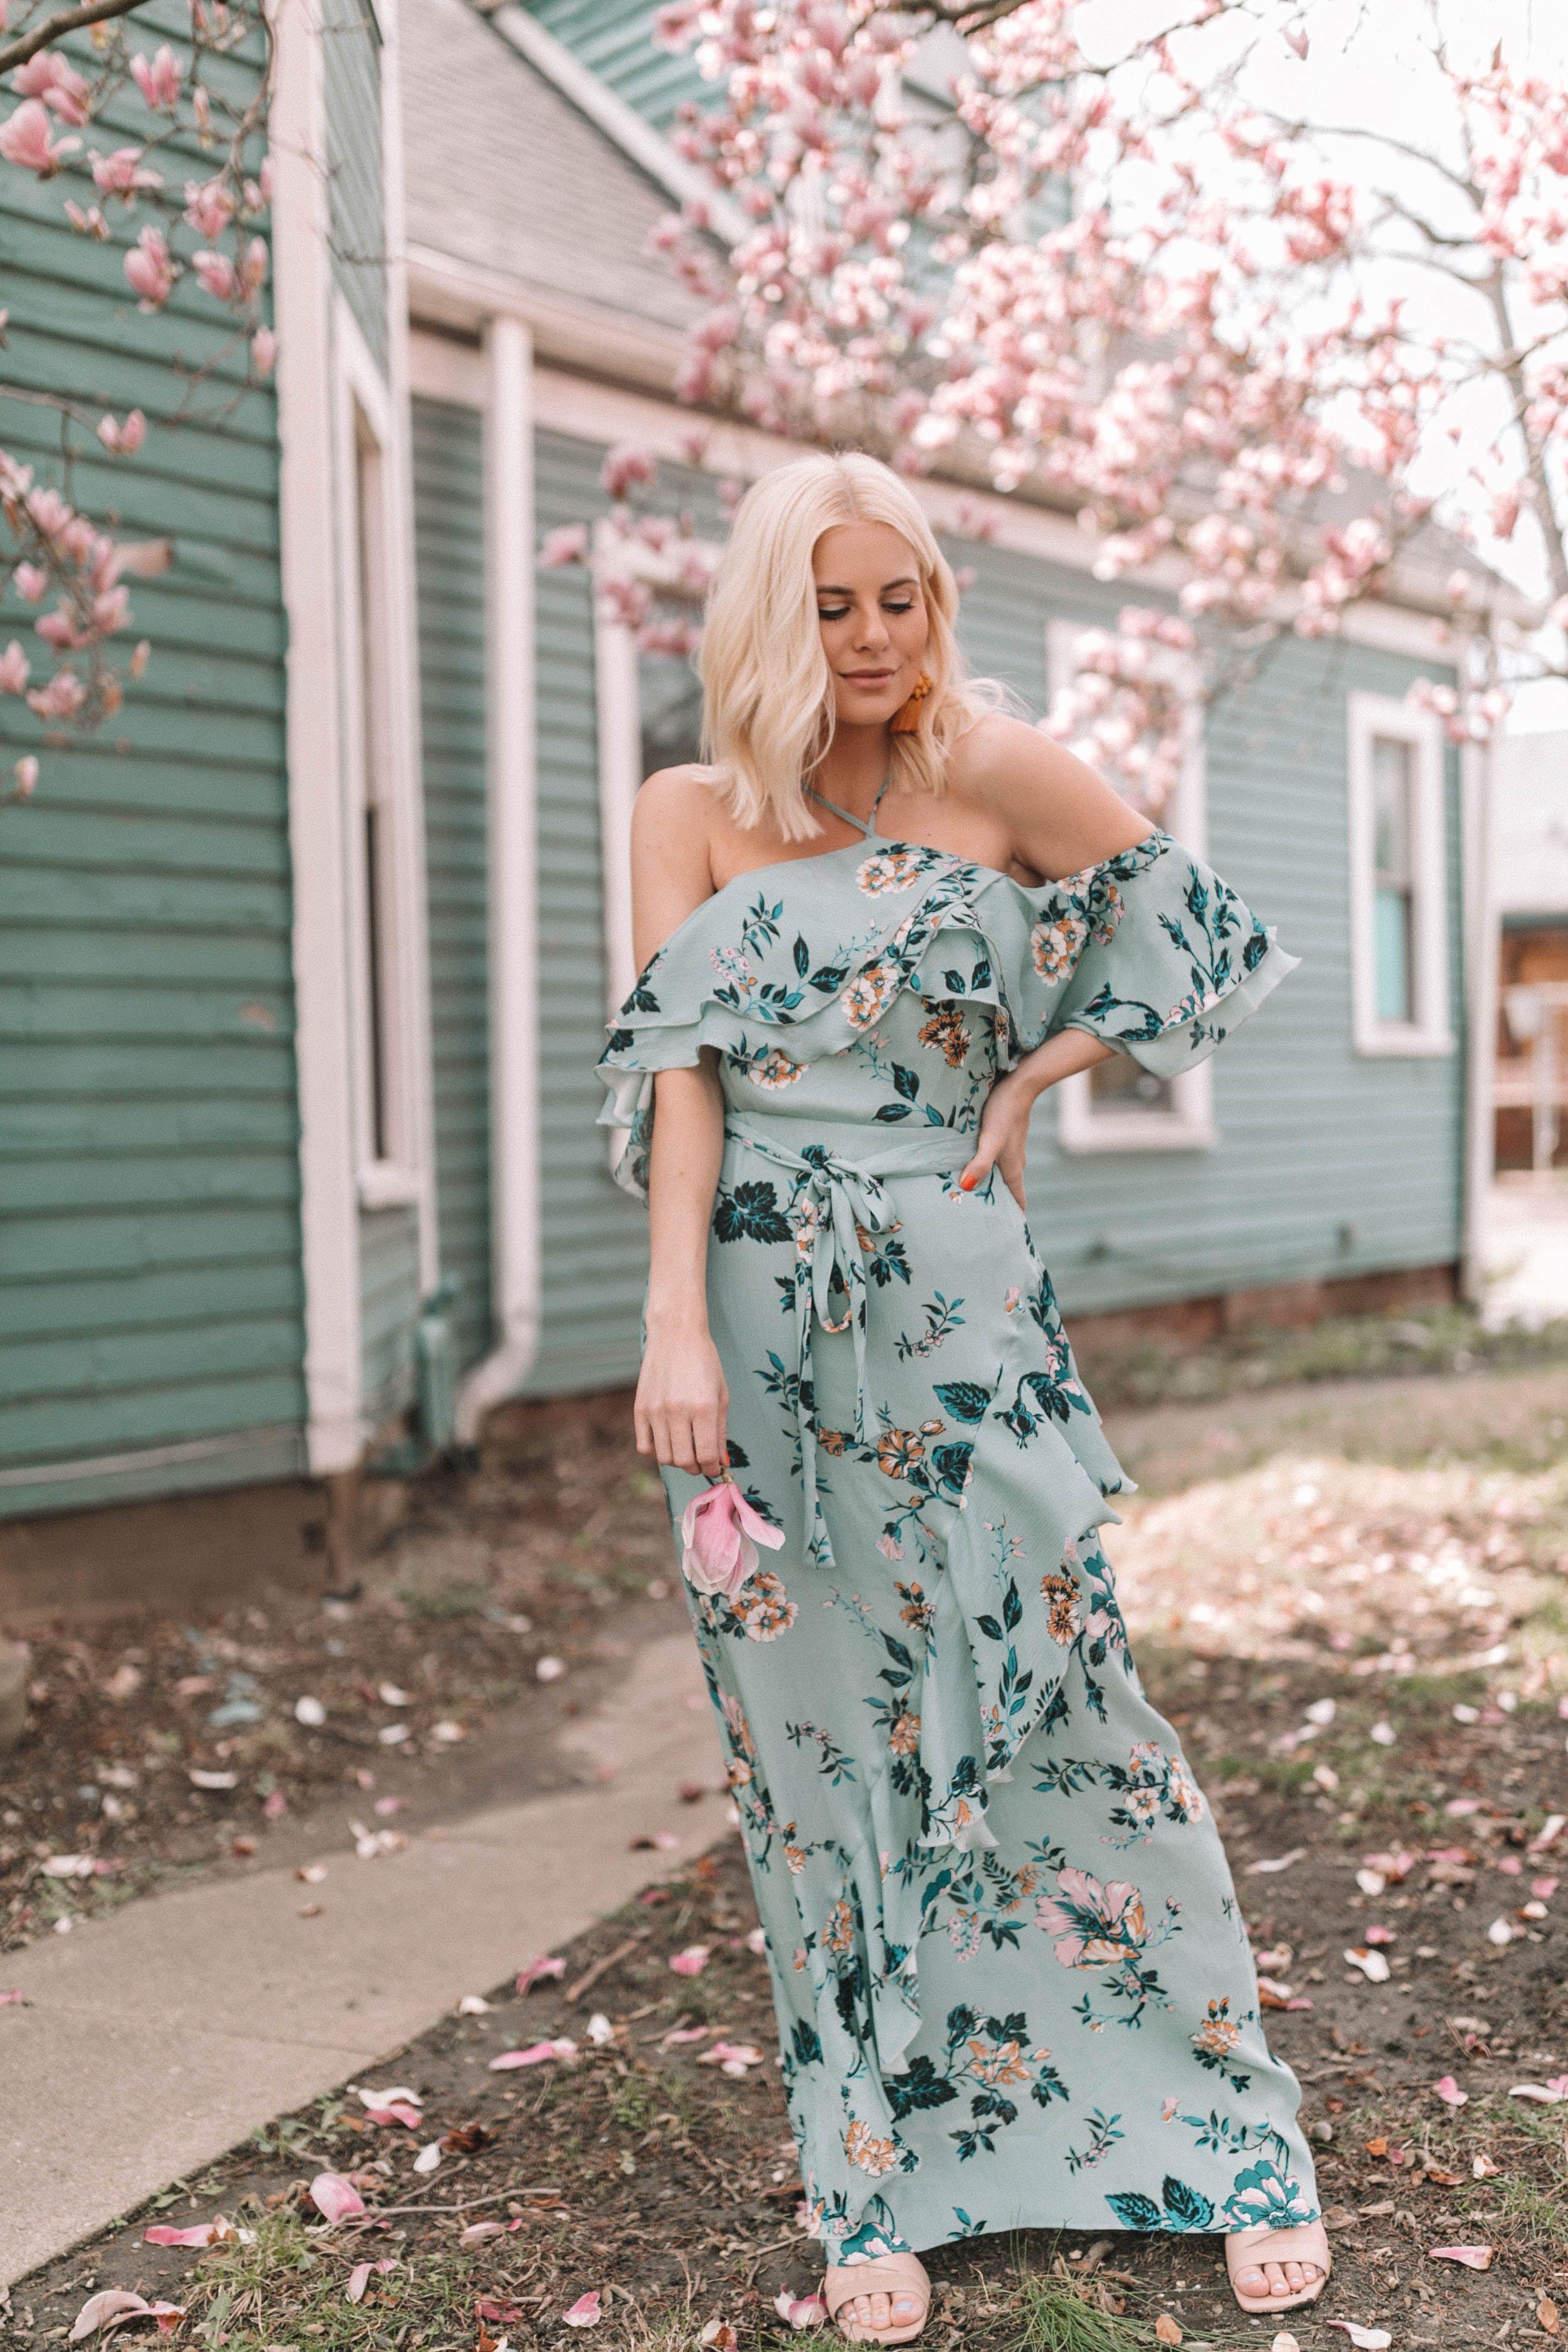 Wedding attendee dresses  Wedding Season  Fashion and Lifestyle Bloggers  Pinterest  Floral